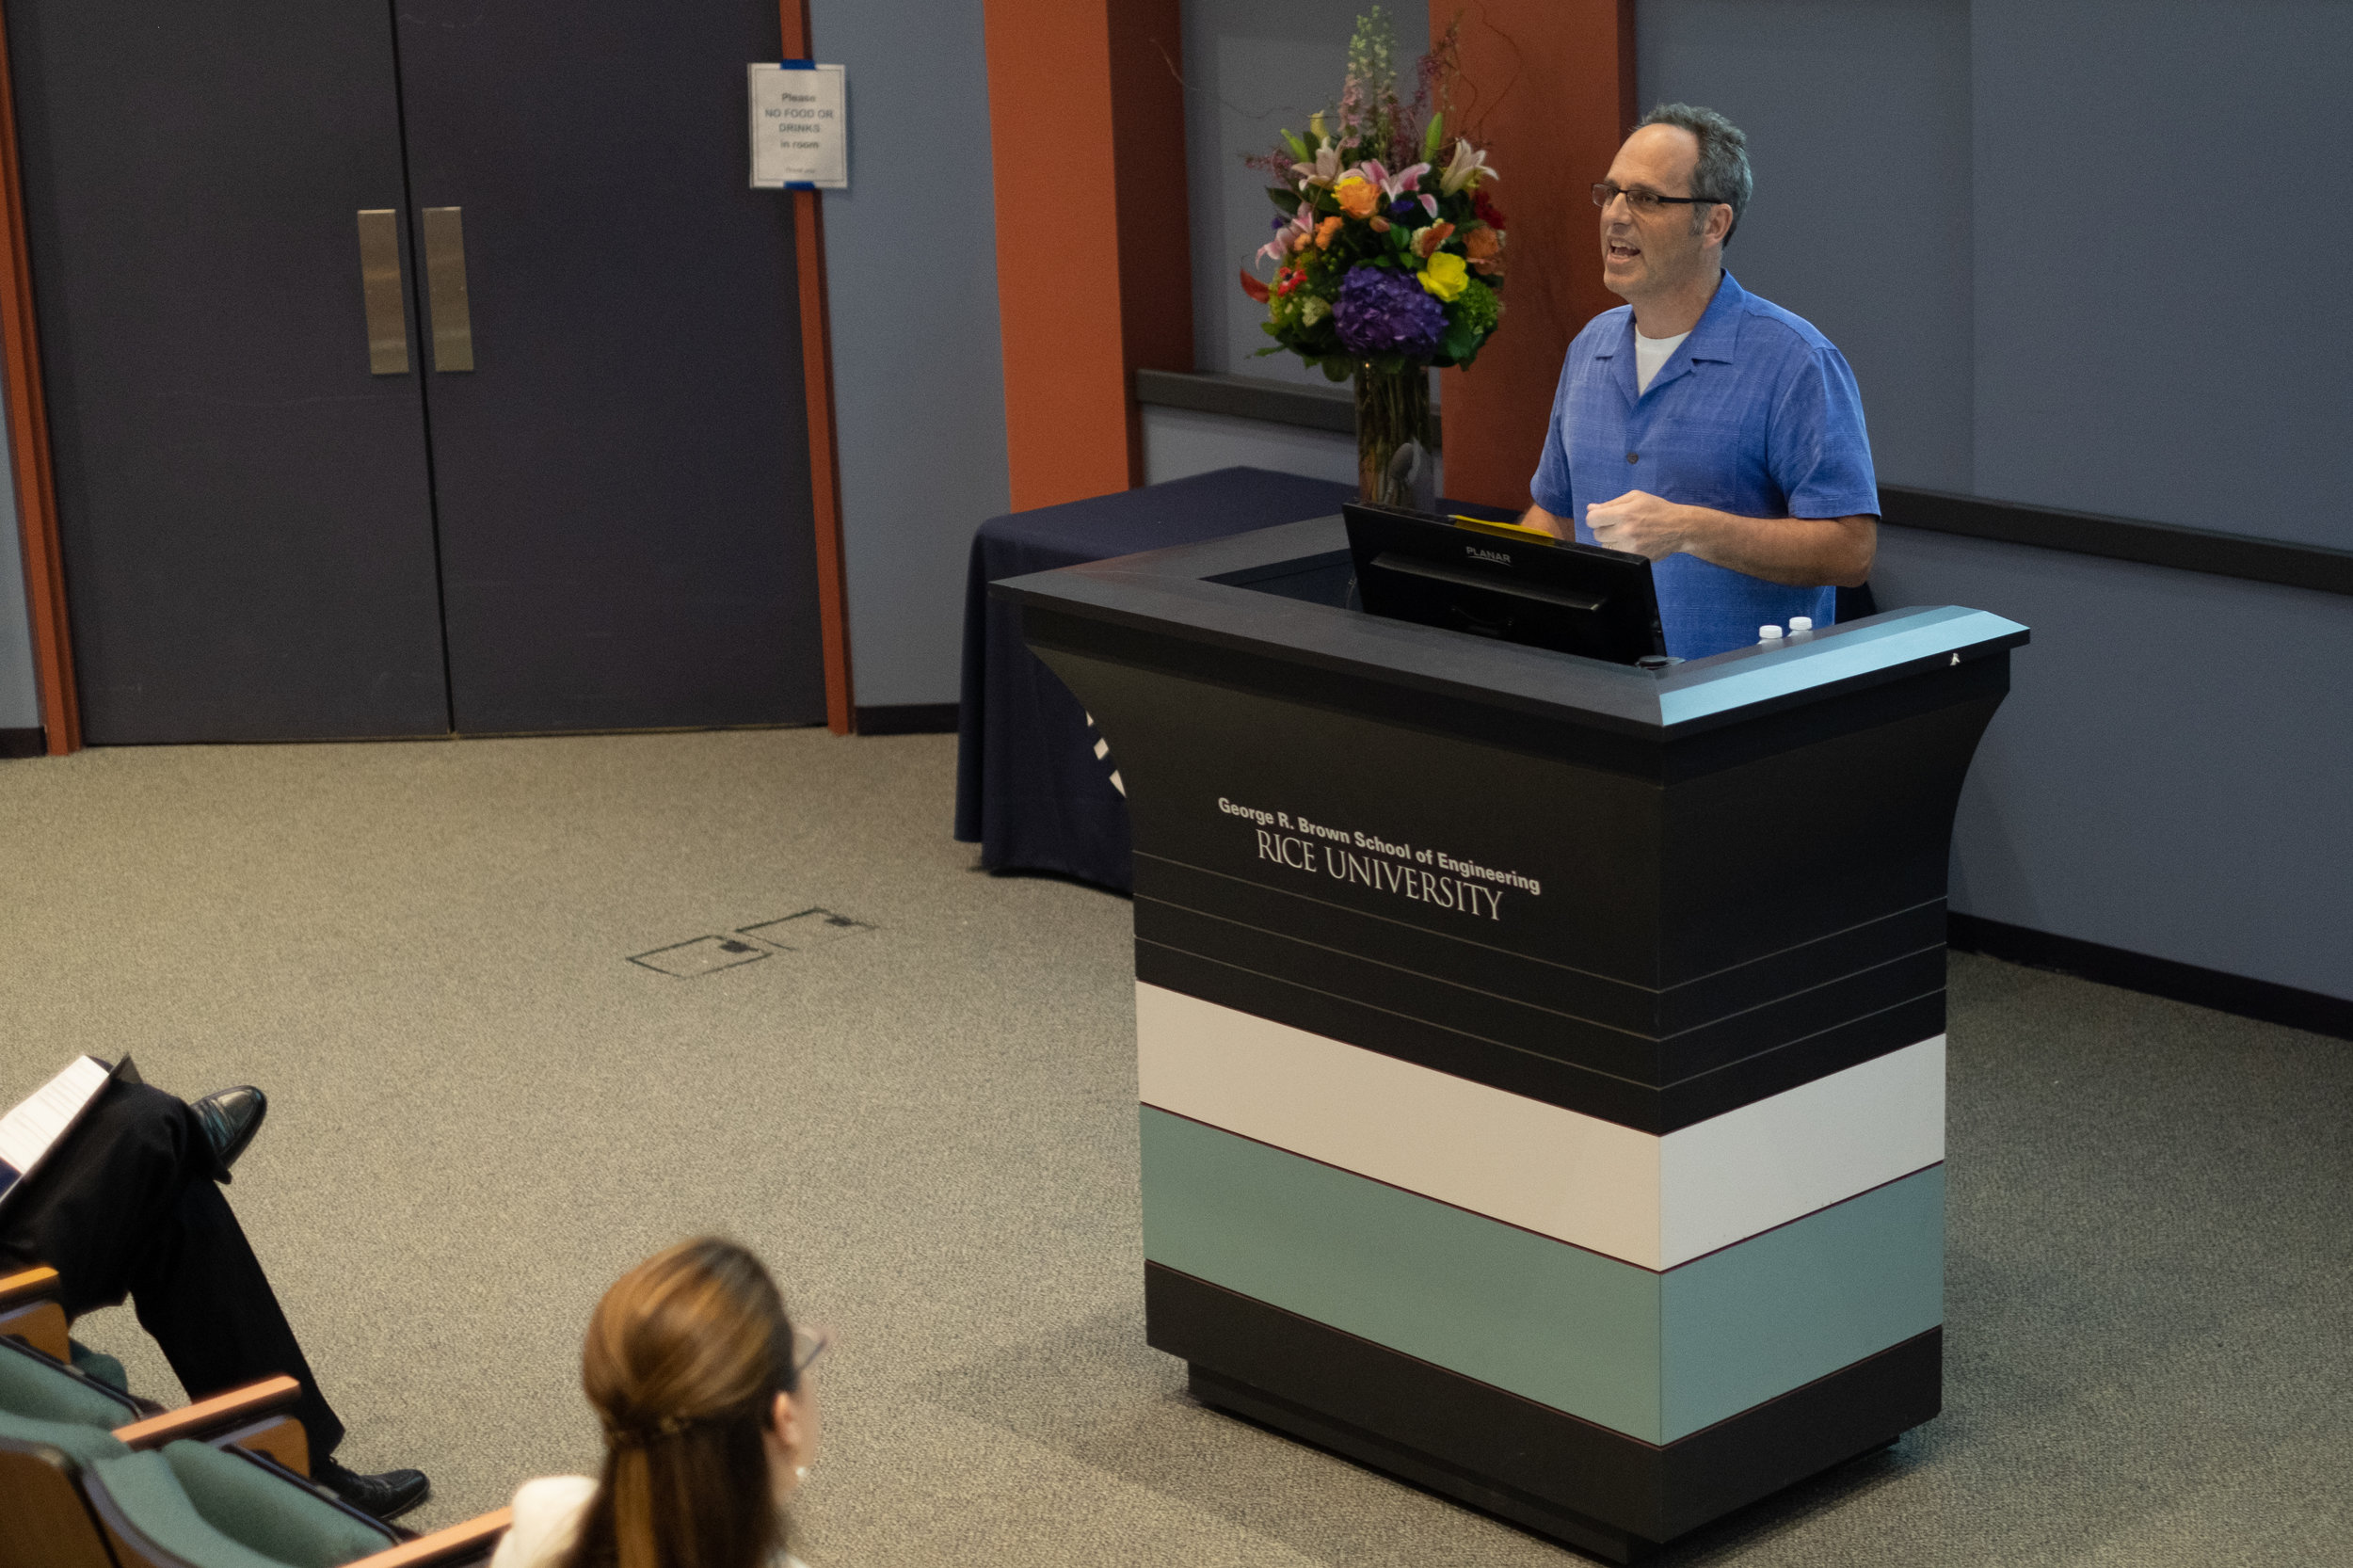 Jim Elliott, Professor and Department Chair of Sociology introducing Robert Werth